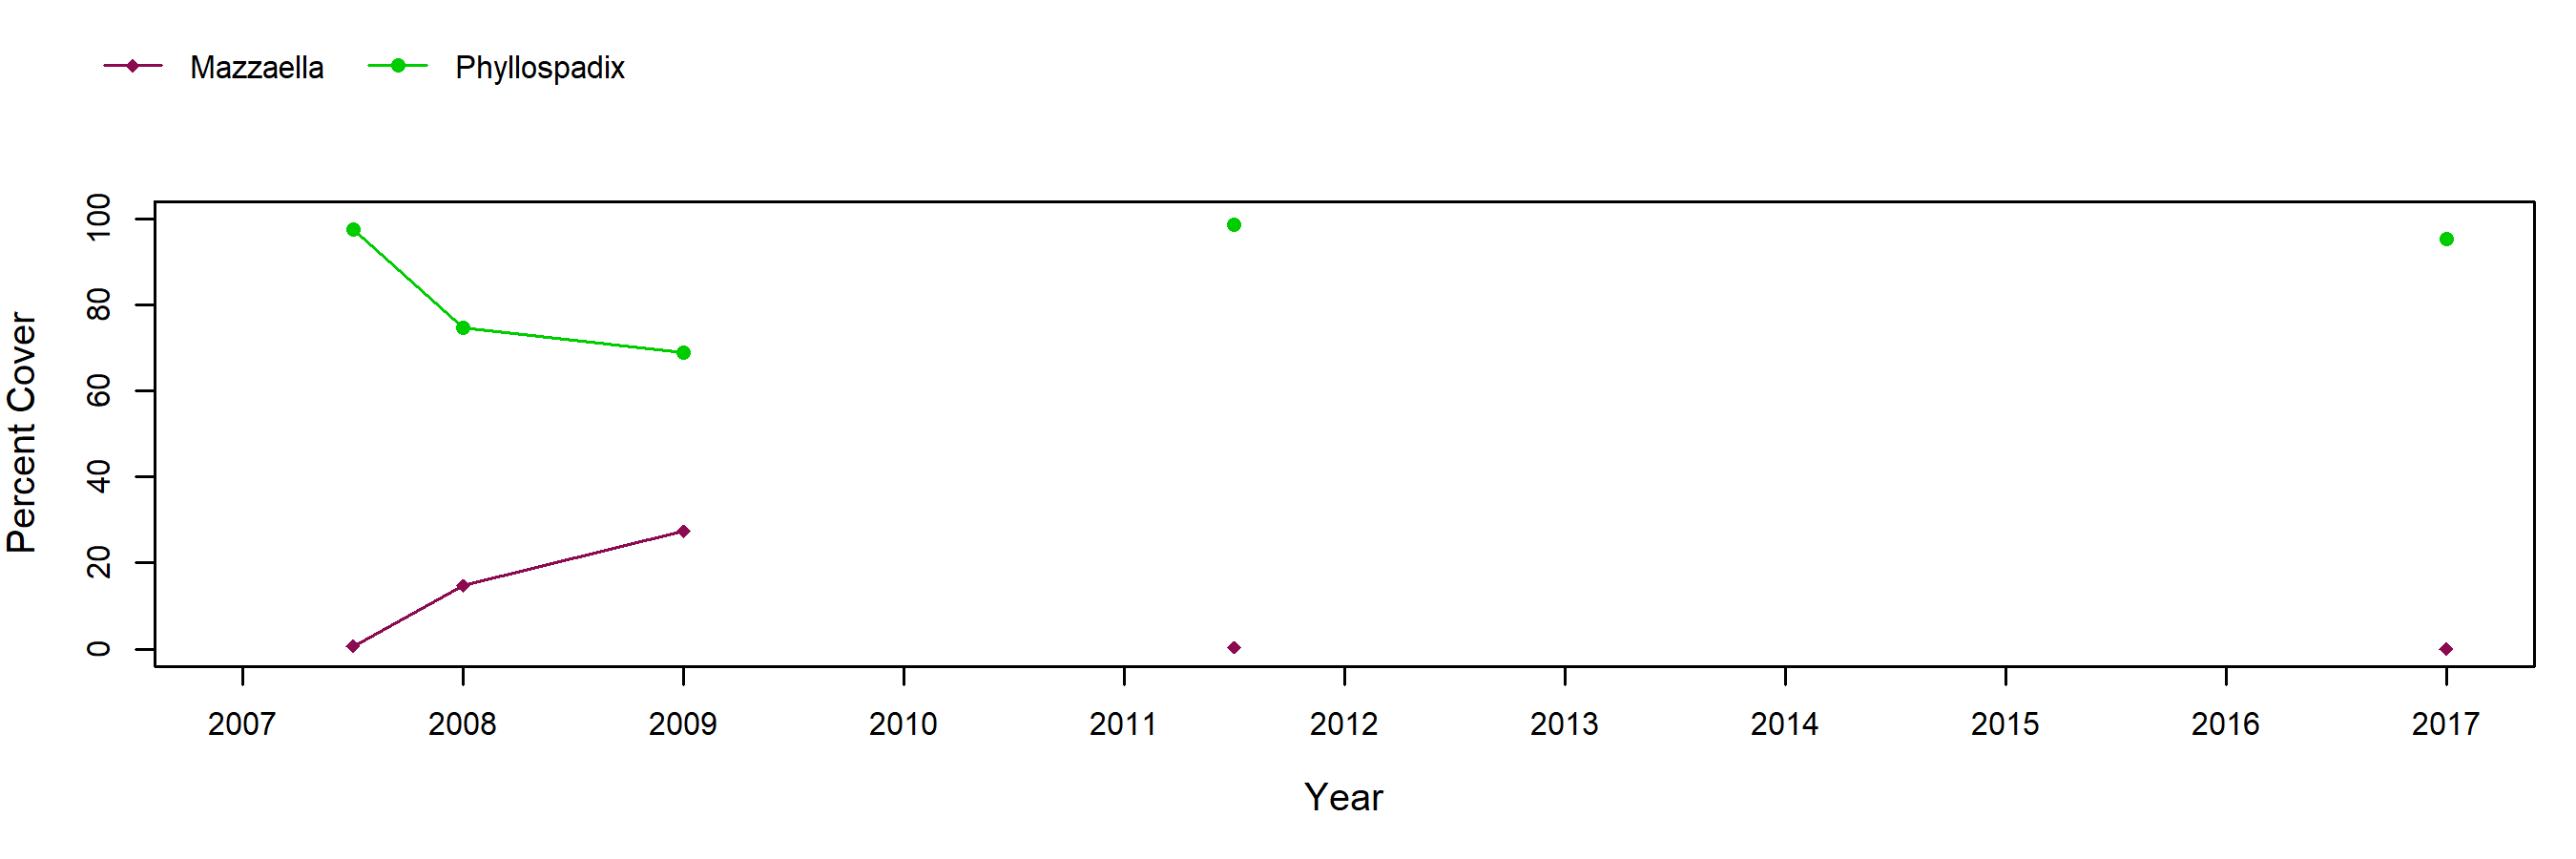 Diablo surfgrass trend plot